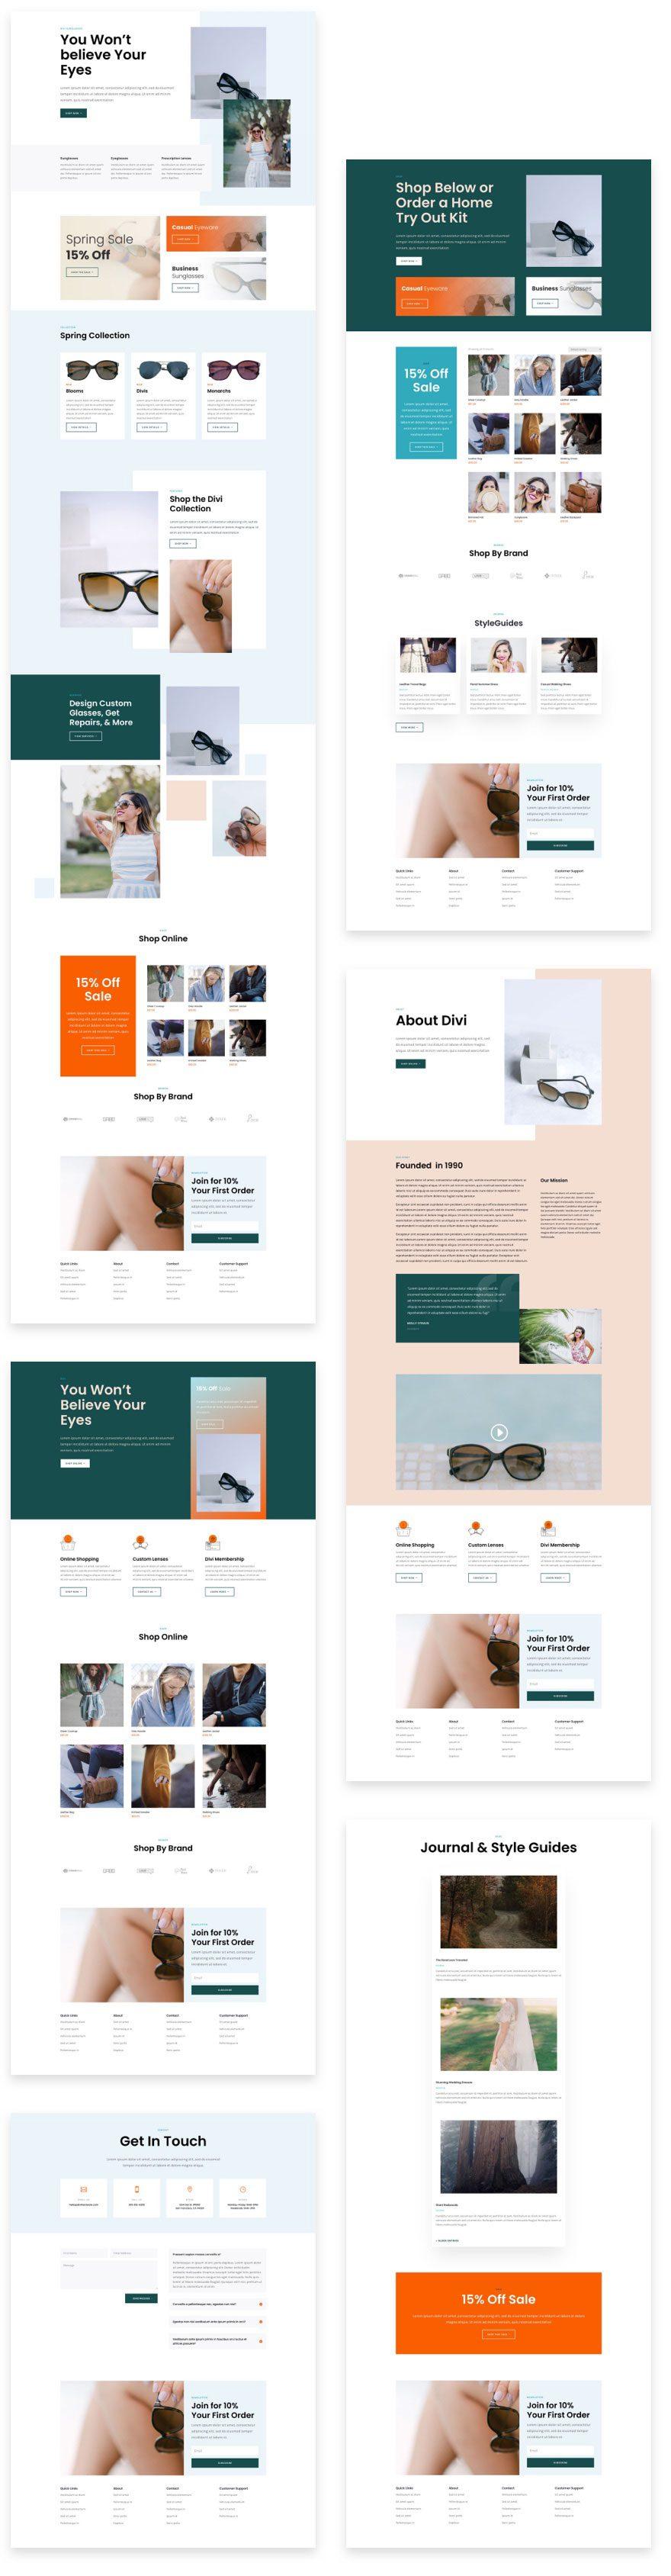 sunglasses shop website